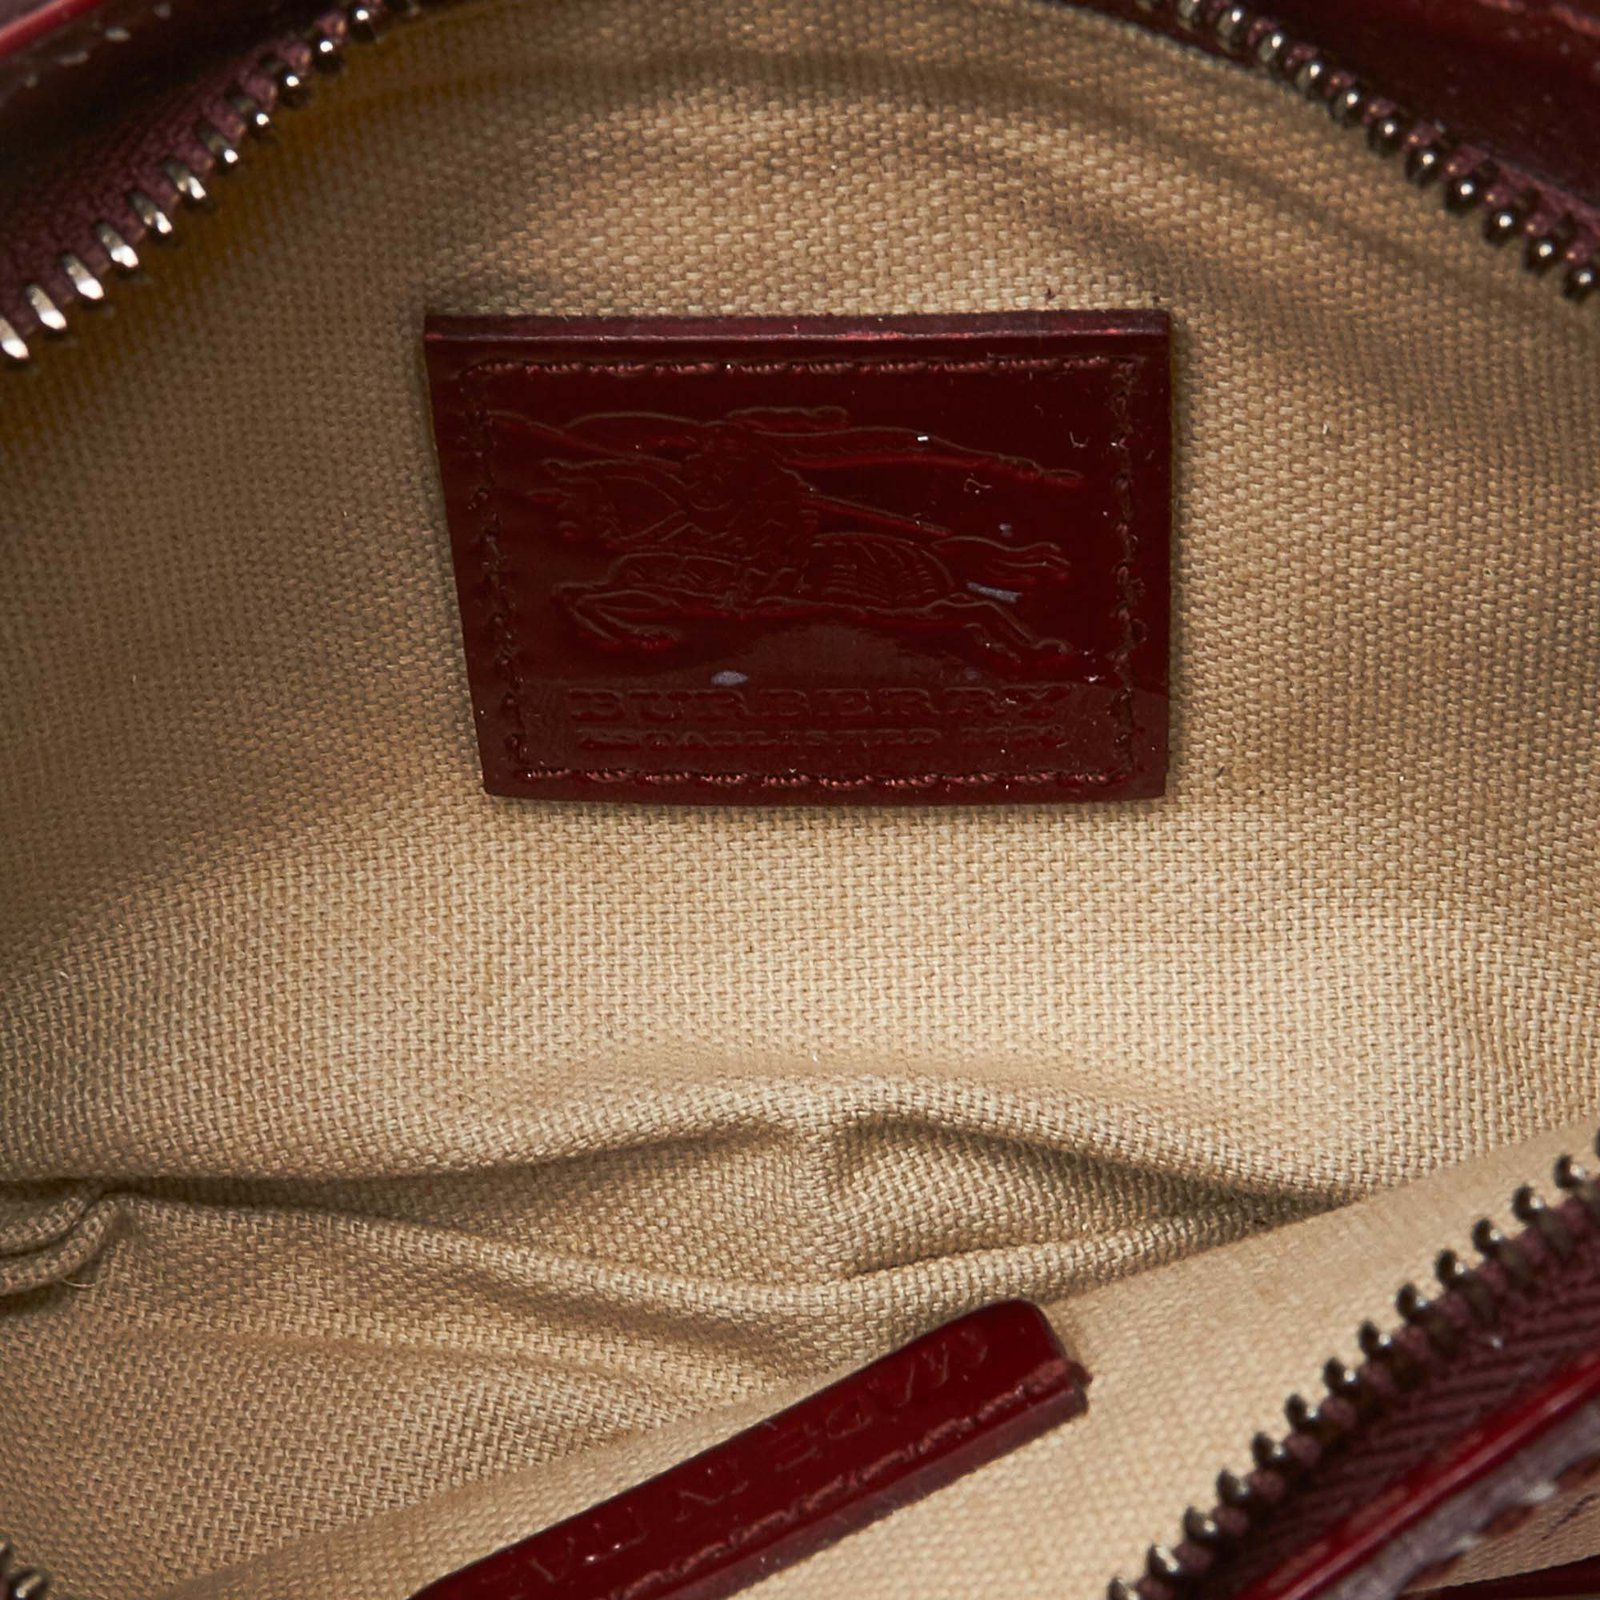 f3957dff7008 Burberry Heart Nova Check Baguette Handbags Leather